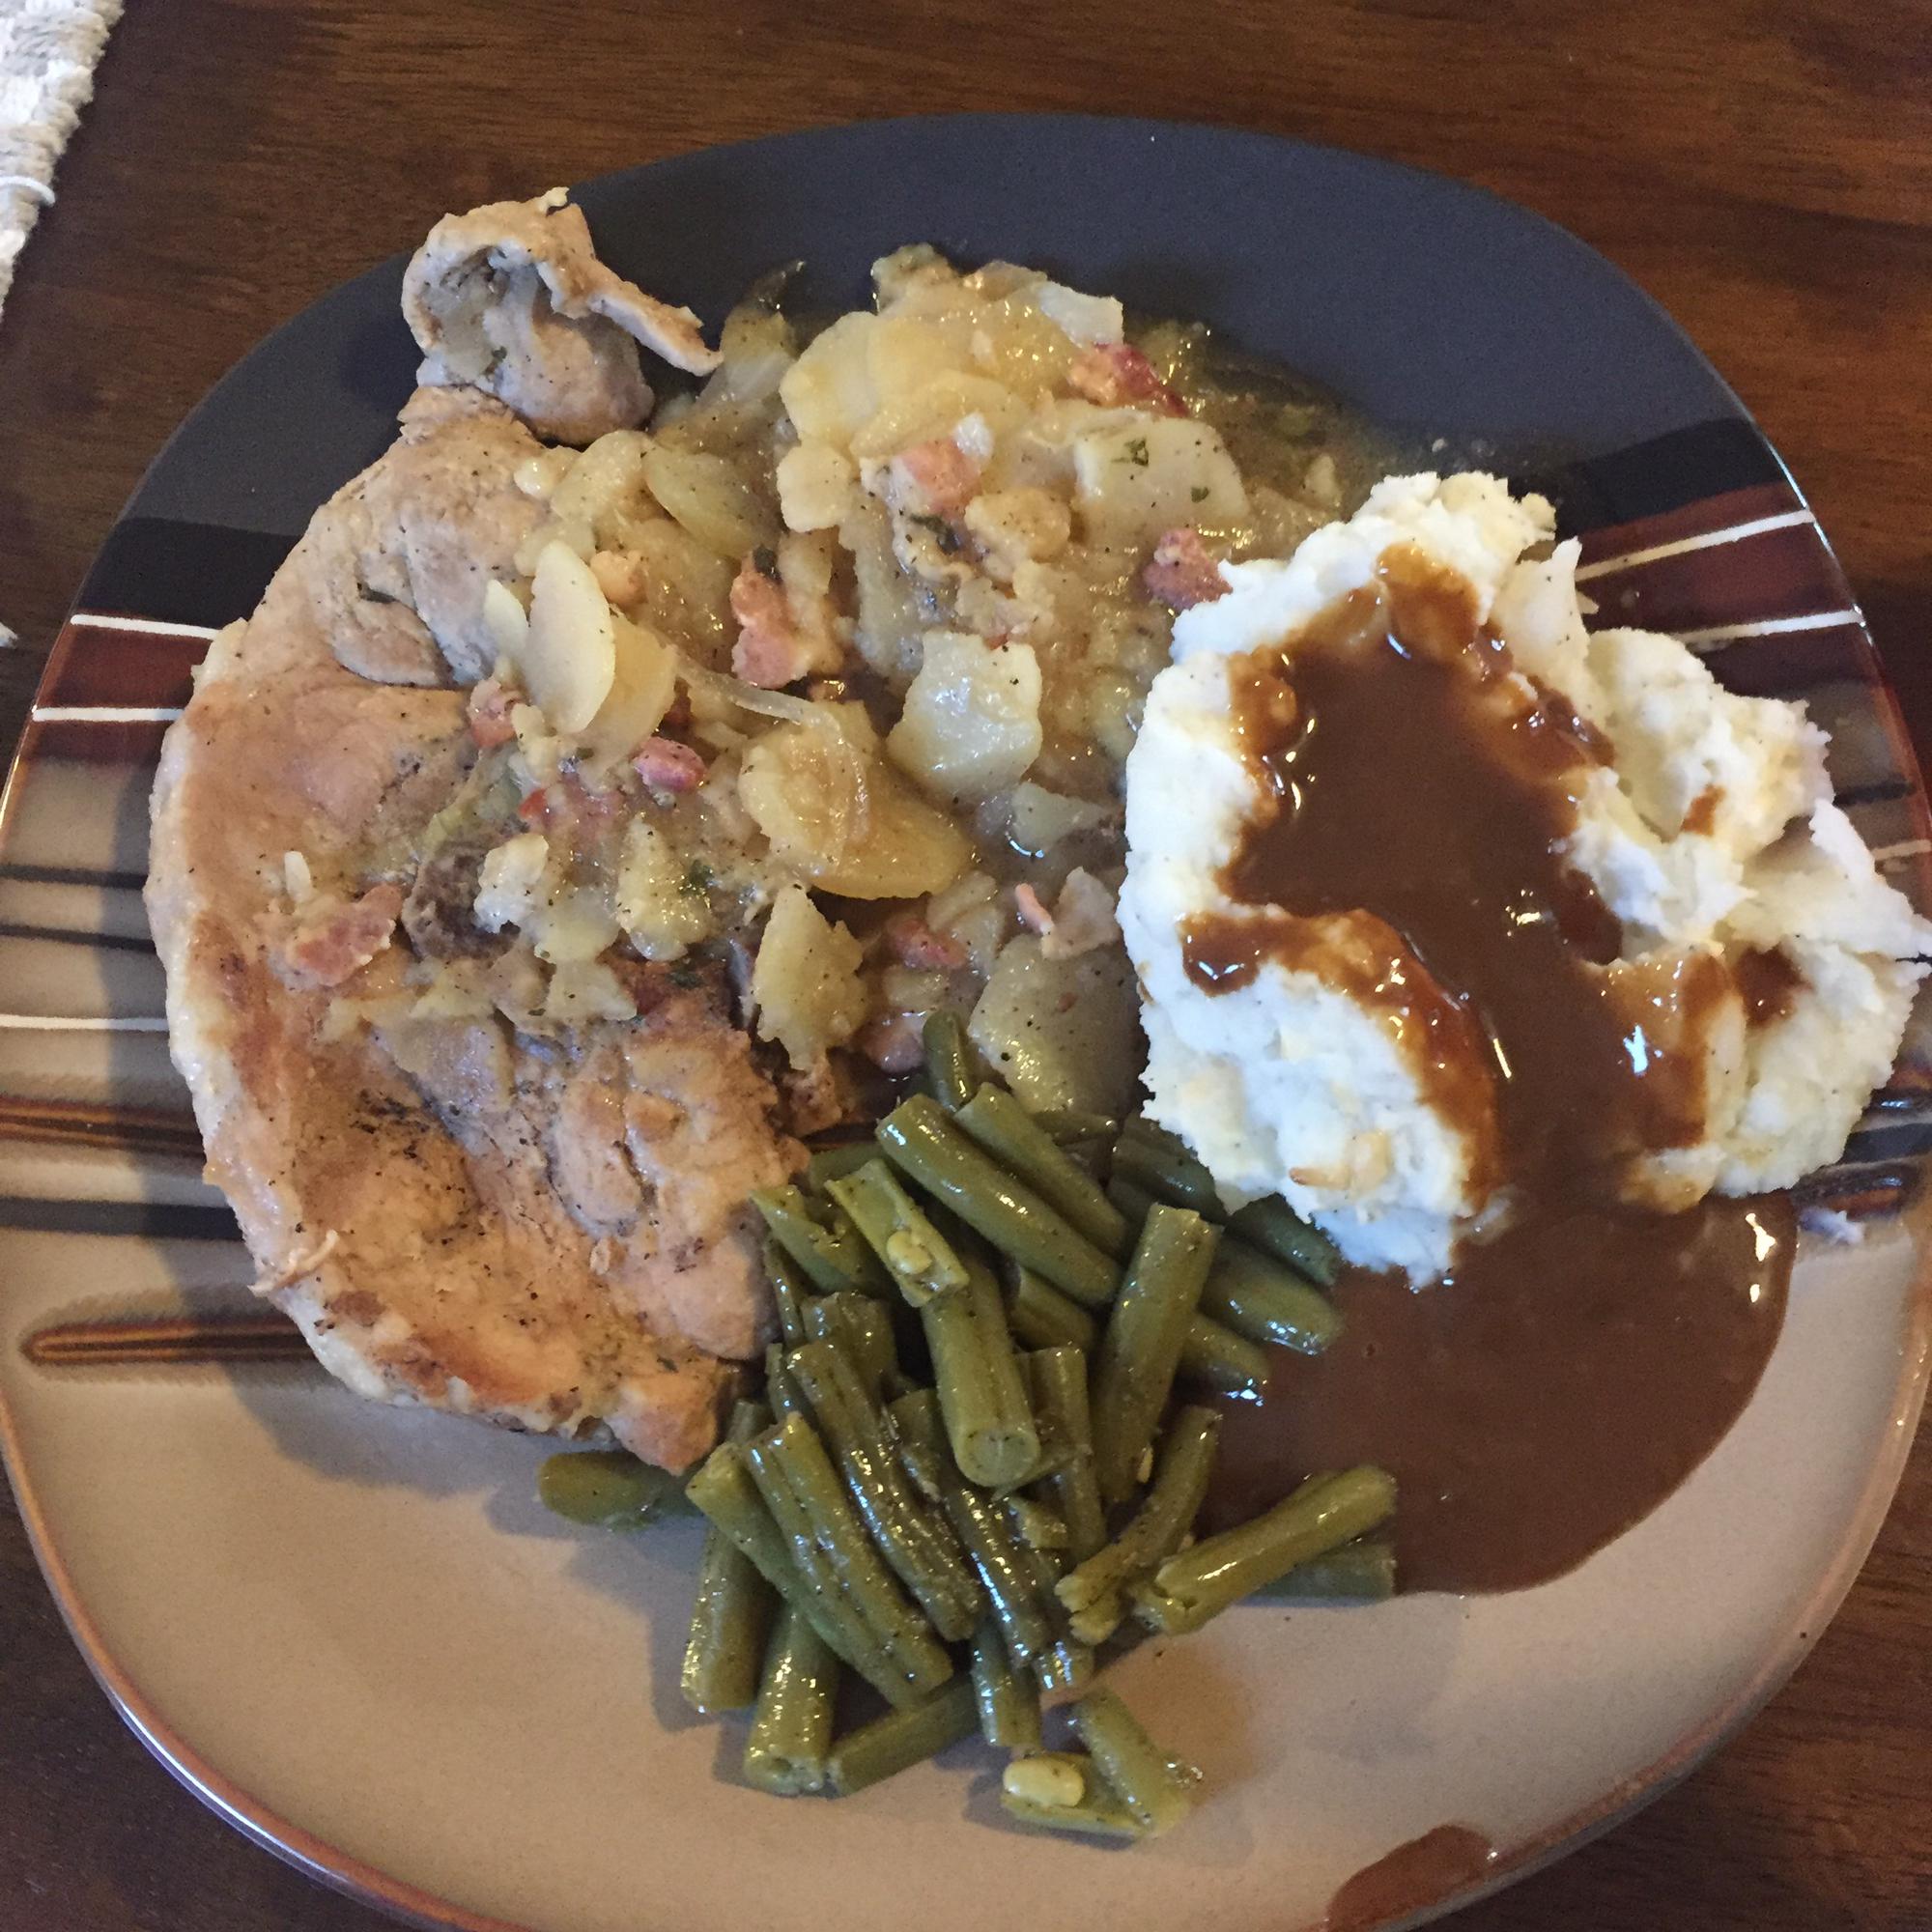 Grandmother's Pork Chop Dinner